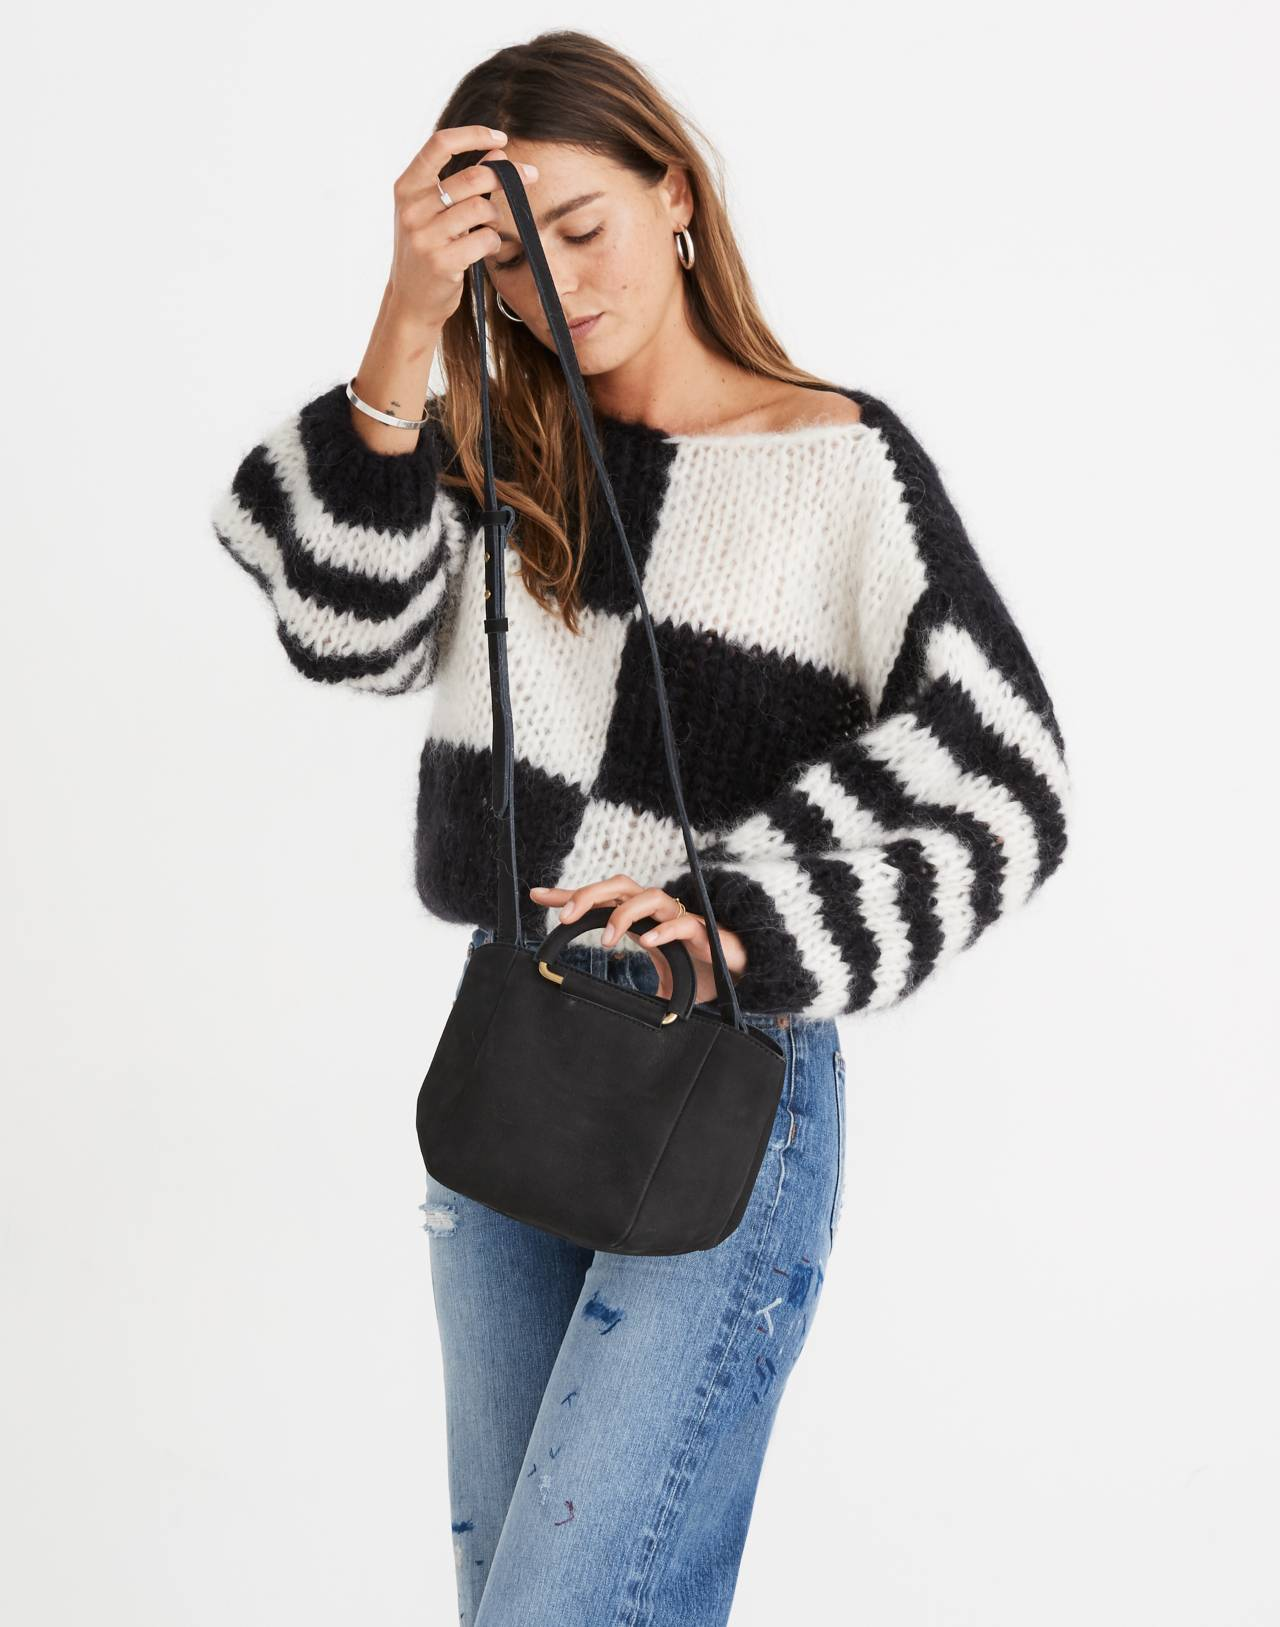 The Top-Handle Mini Bag in true black image 2